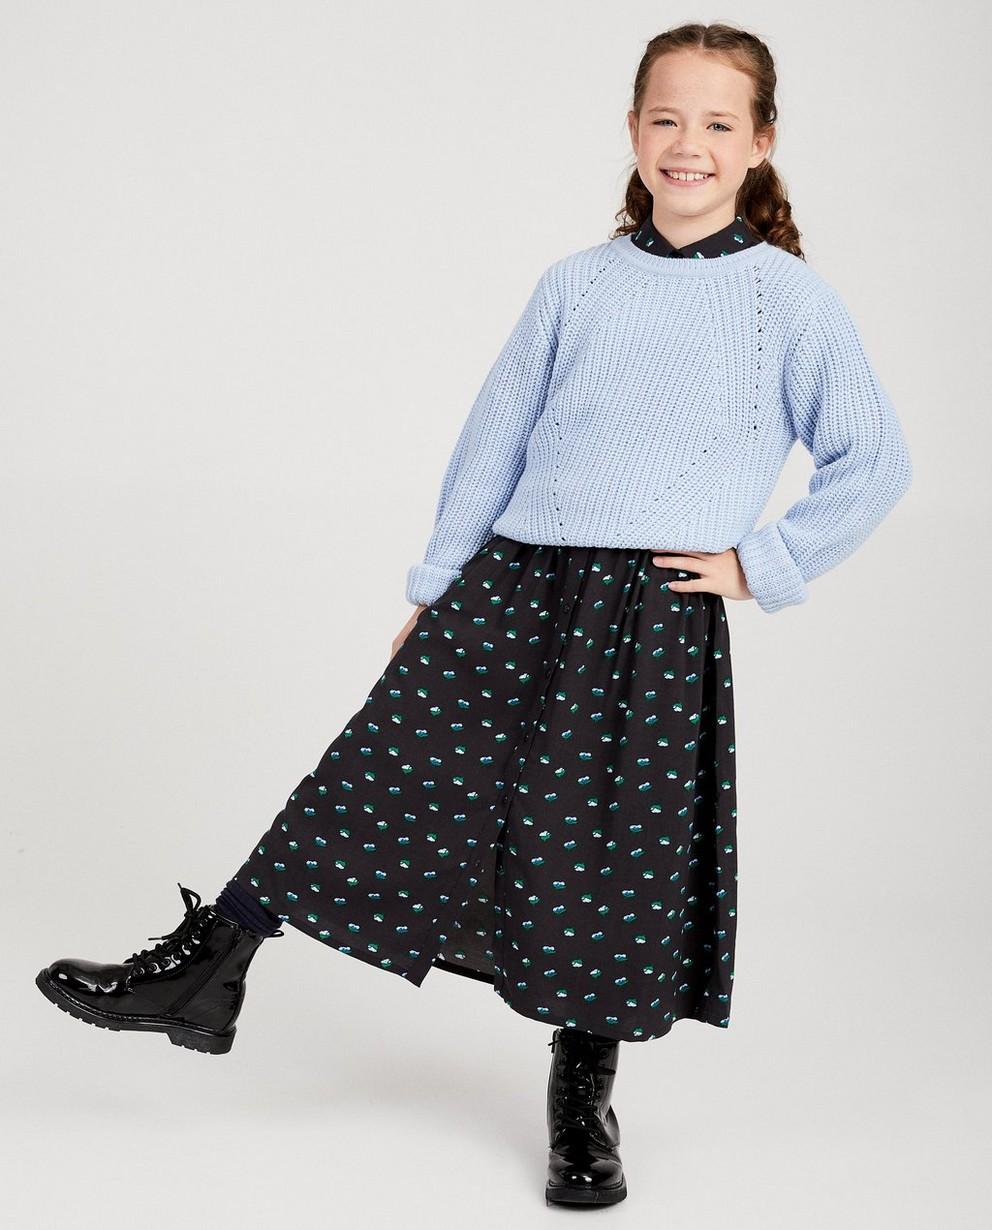 Pull en tricot bleu clair - tricot d'épaisseur moyenne - JBC